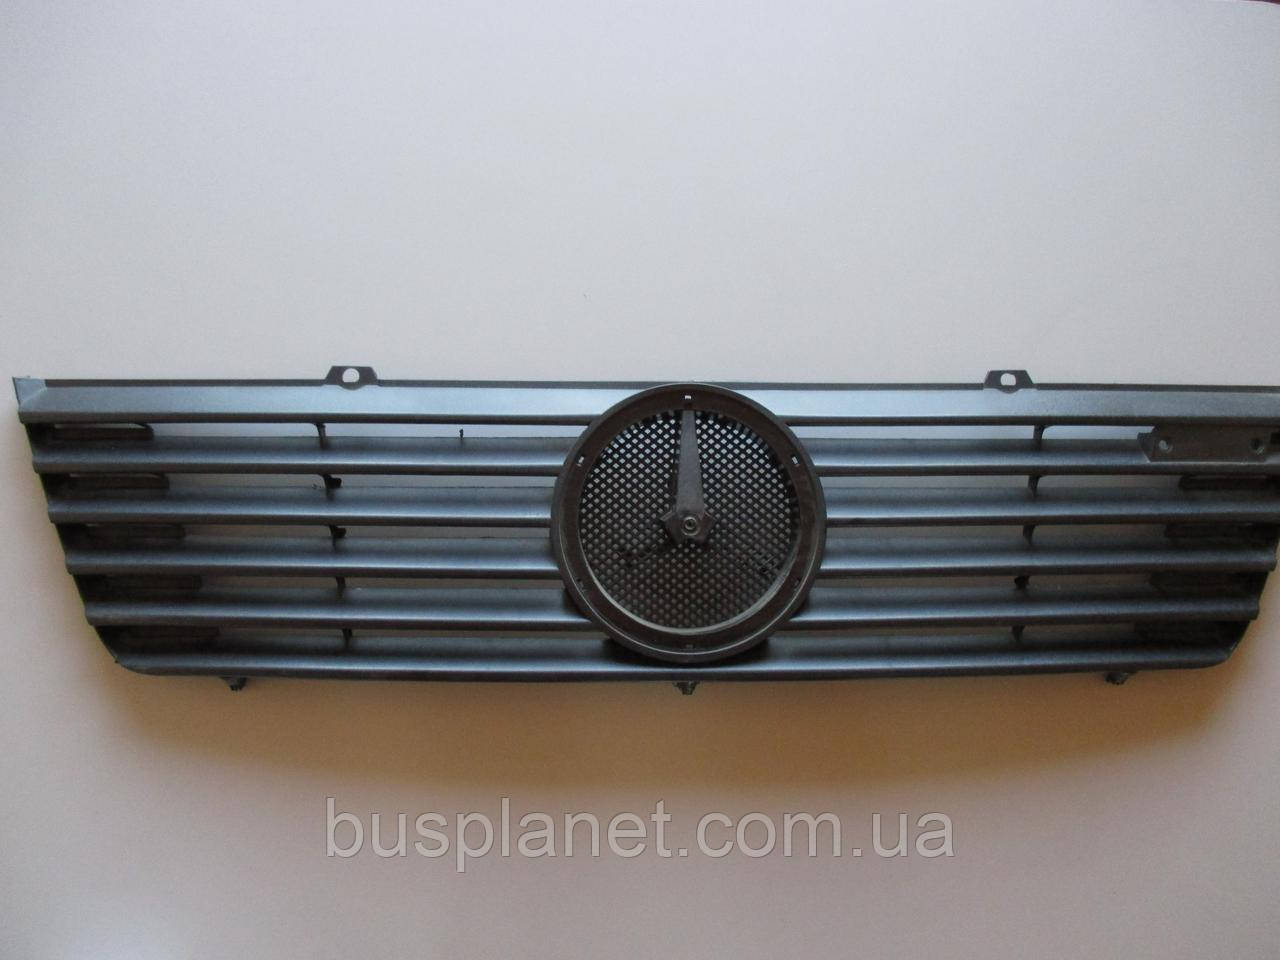 Решетка радиатора Mercedes Sprinter TDI